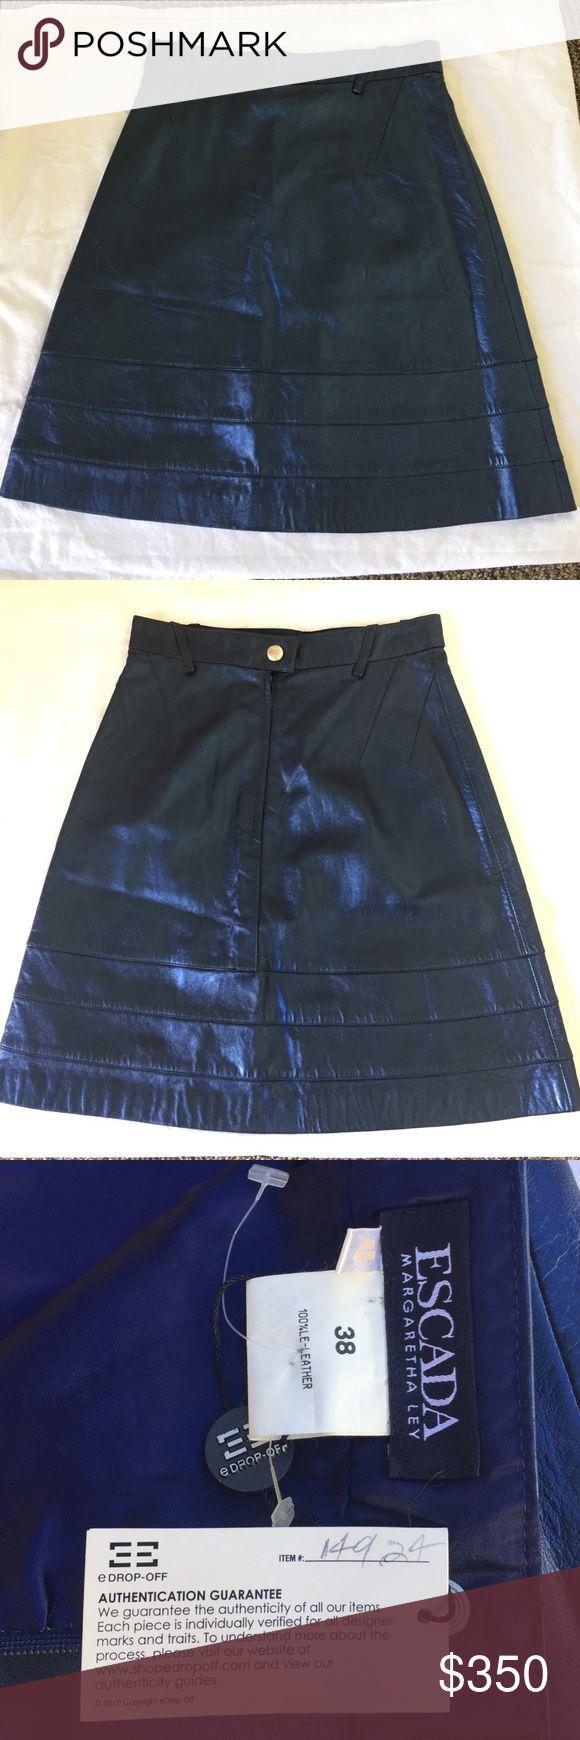 Escada Margaretha Ley Leather Skirt 💙💙 Beautiful blue leather skirt • authentic Escada with authentication guarantee label attached • very soft • made in Spain • #ithriftforyou #escada #escadaskirt #leatherskirt #blueskirt Escada Skirts